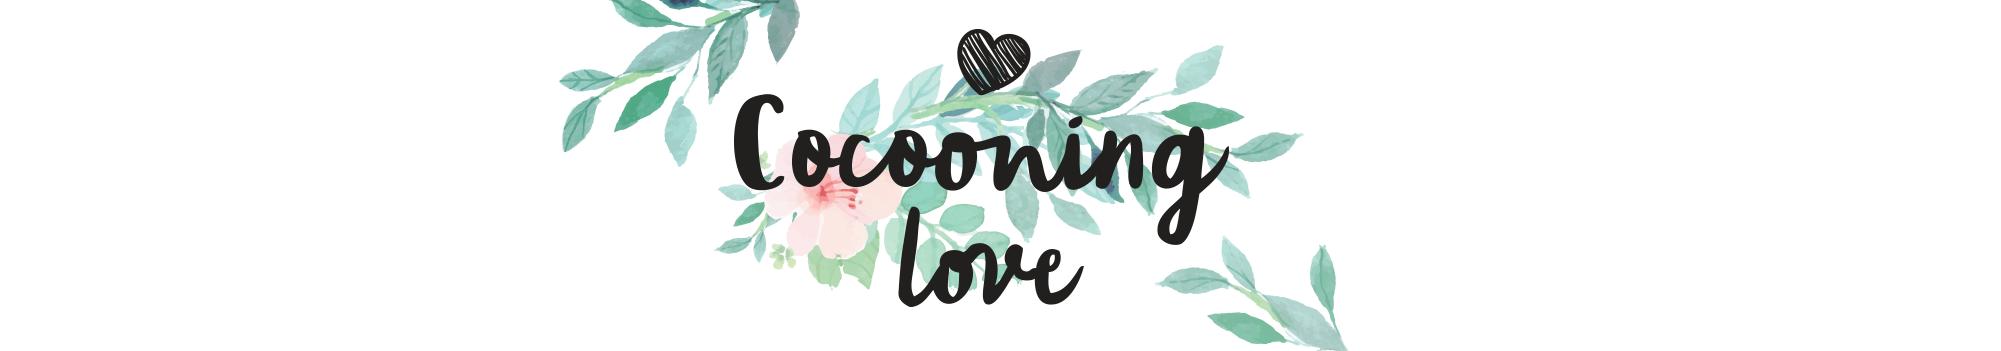 cocooning-love-banniere-logo